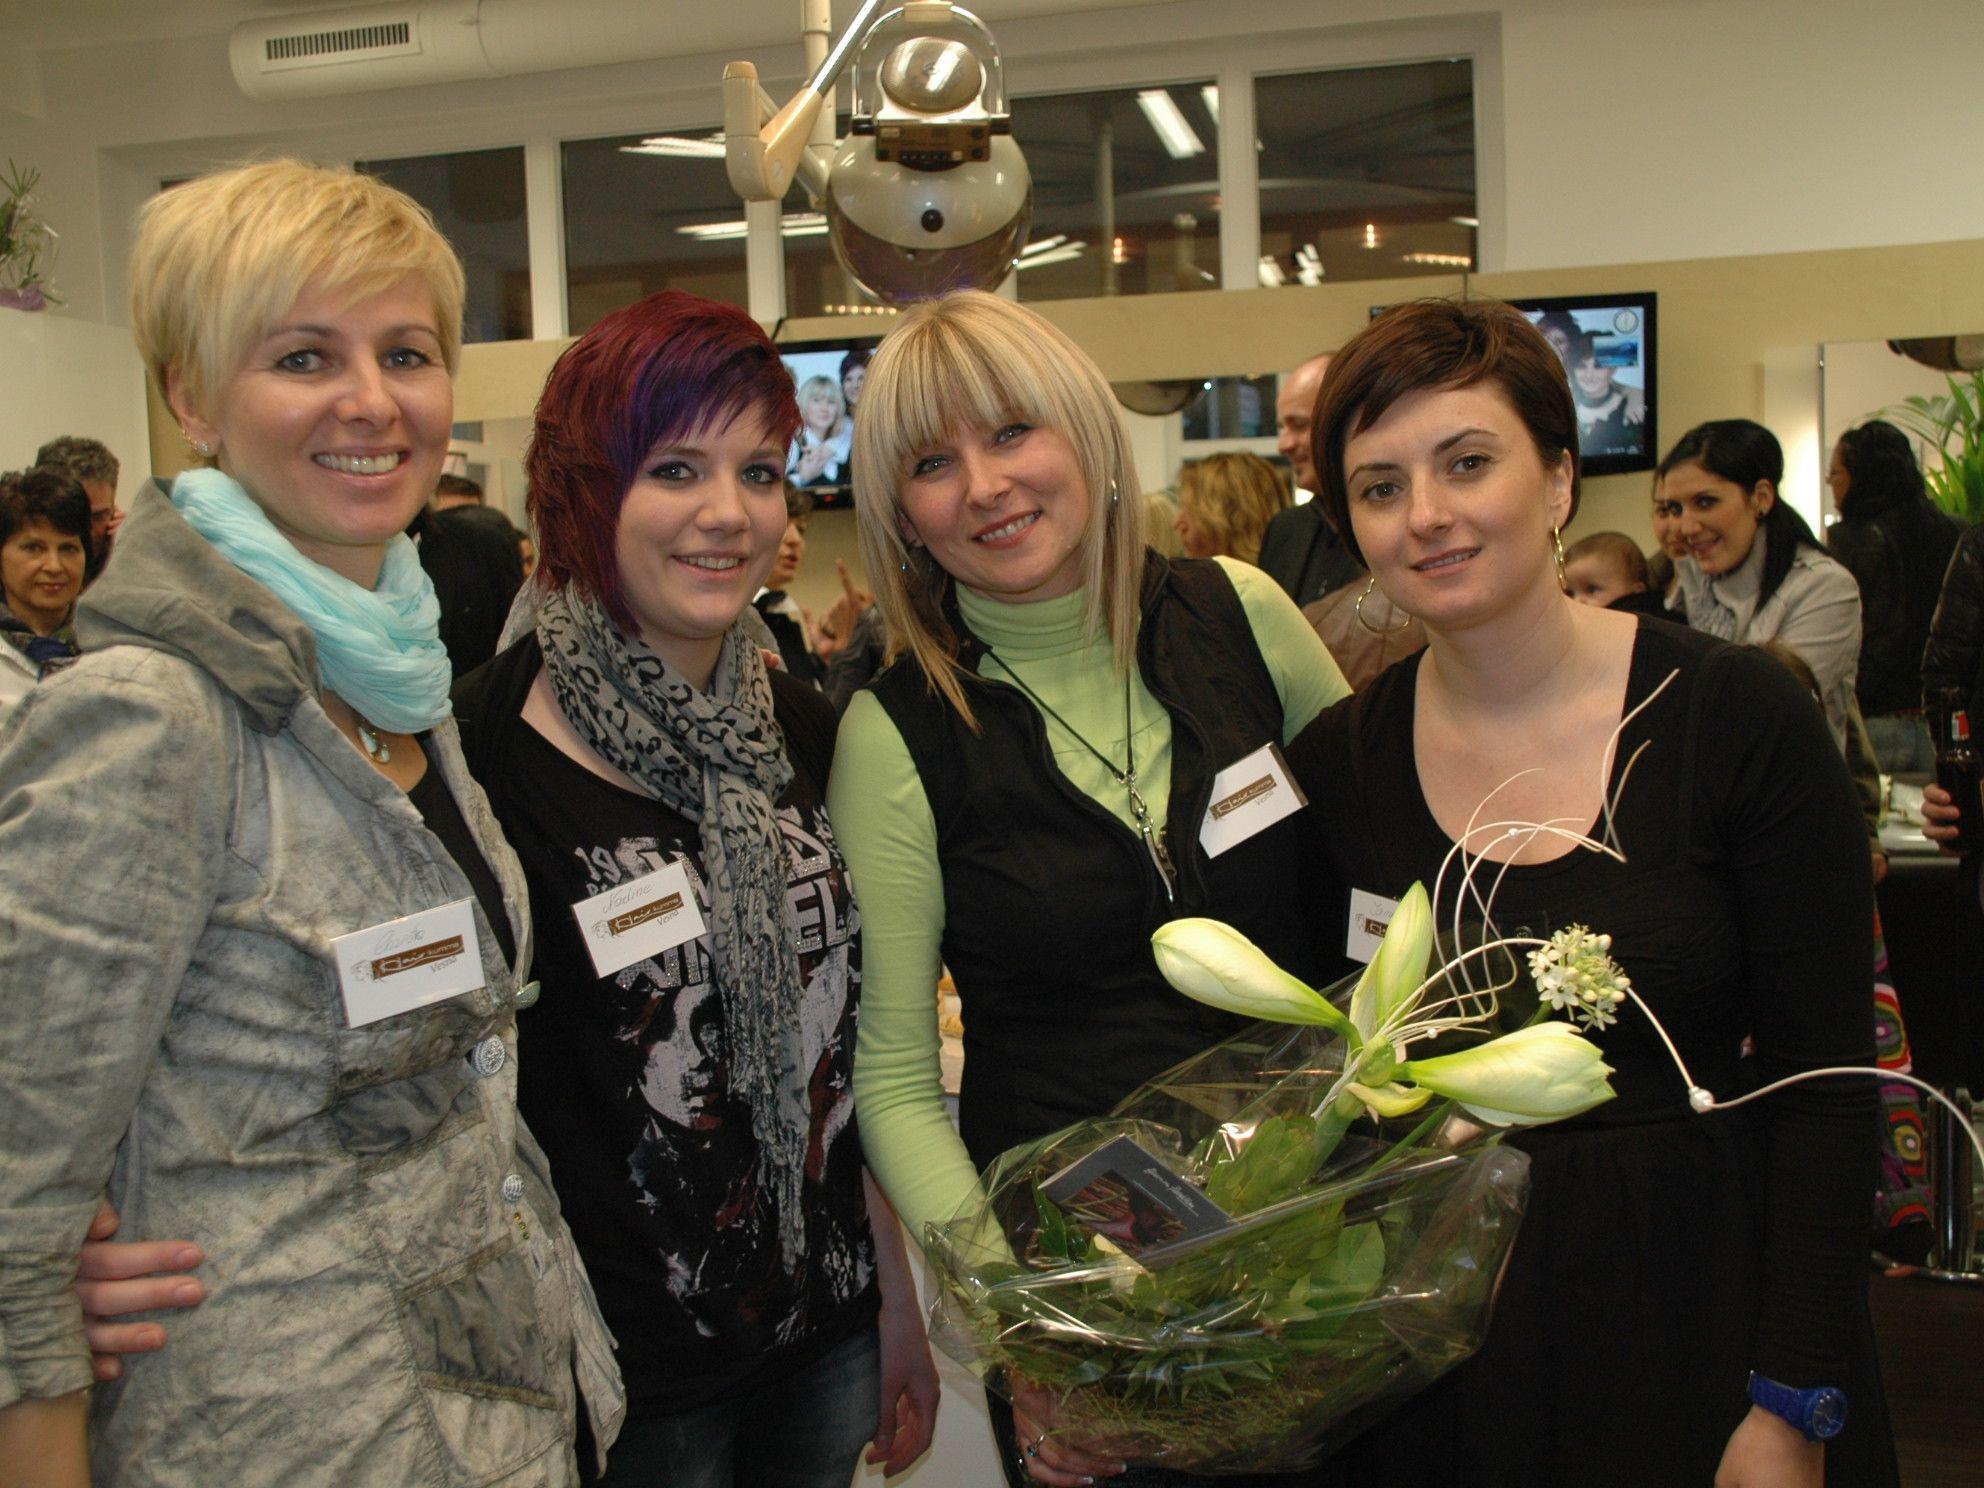 Das Hair Kumma Team auf einen Blick: Christa, Nadine, Chefin Vesna & Irina